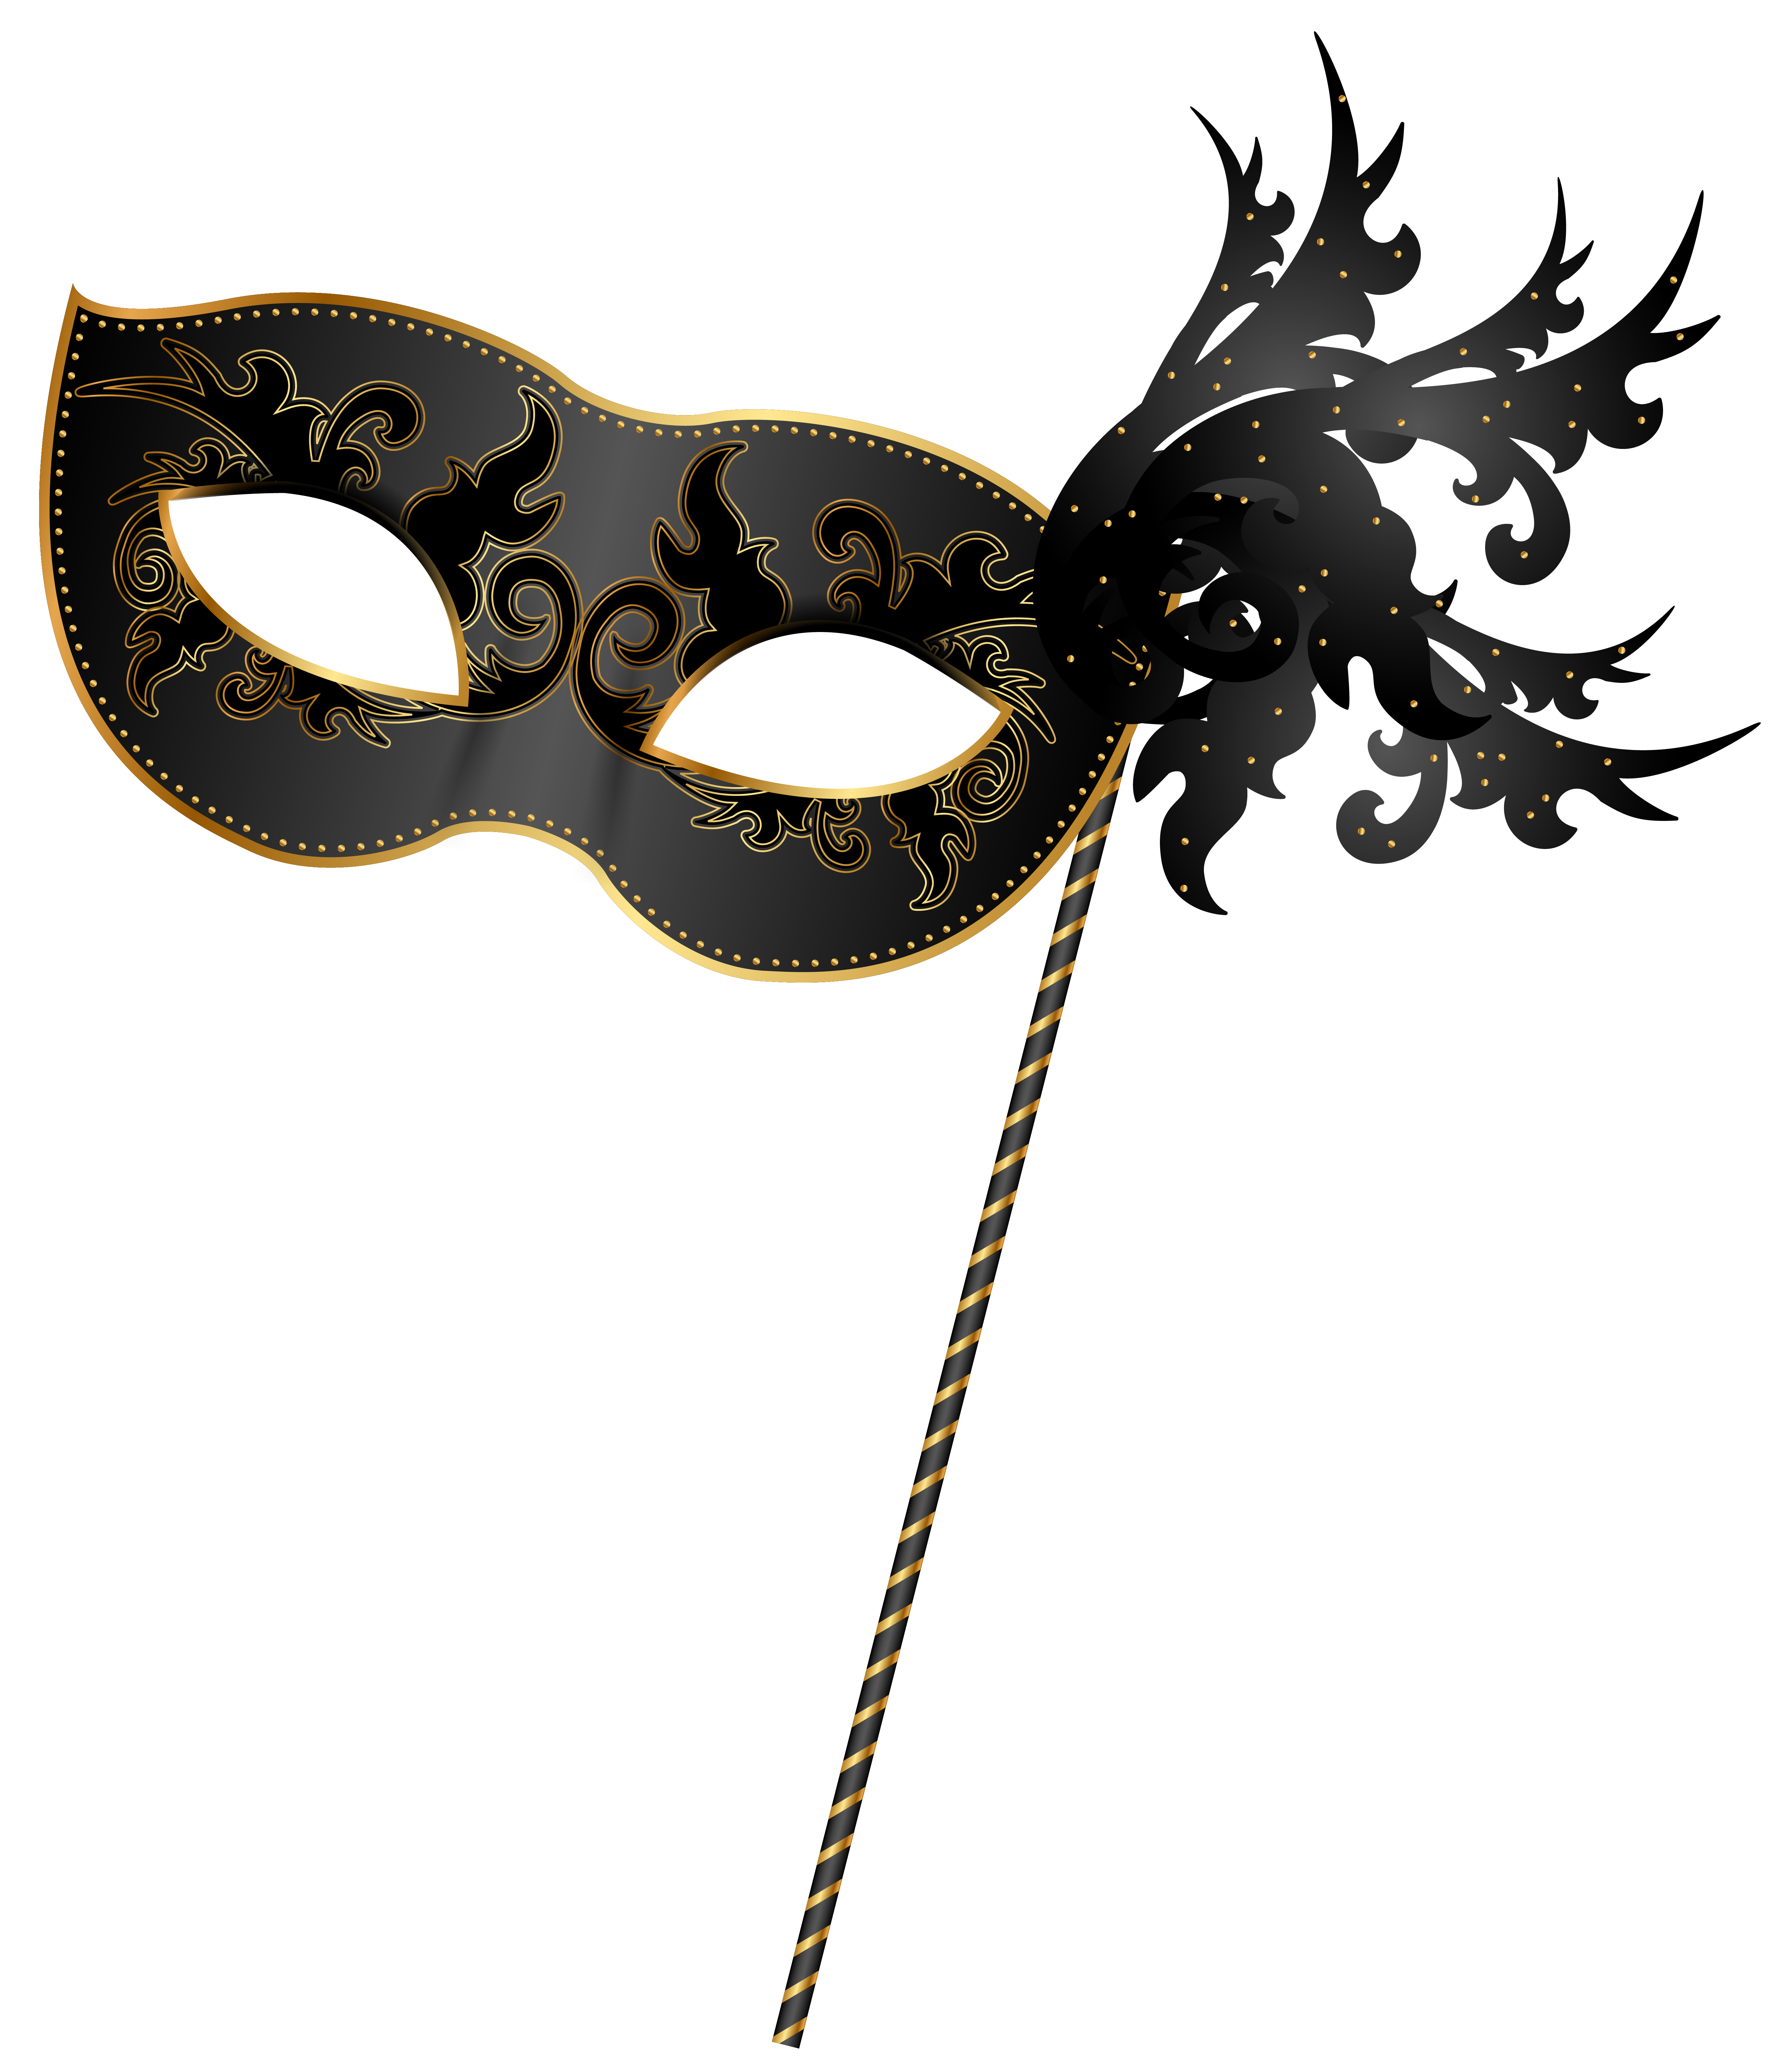 Mascot logo clipart collection Cliparts World 2019 Art